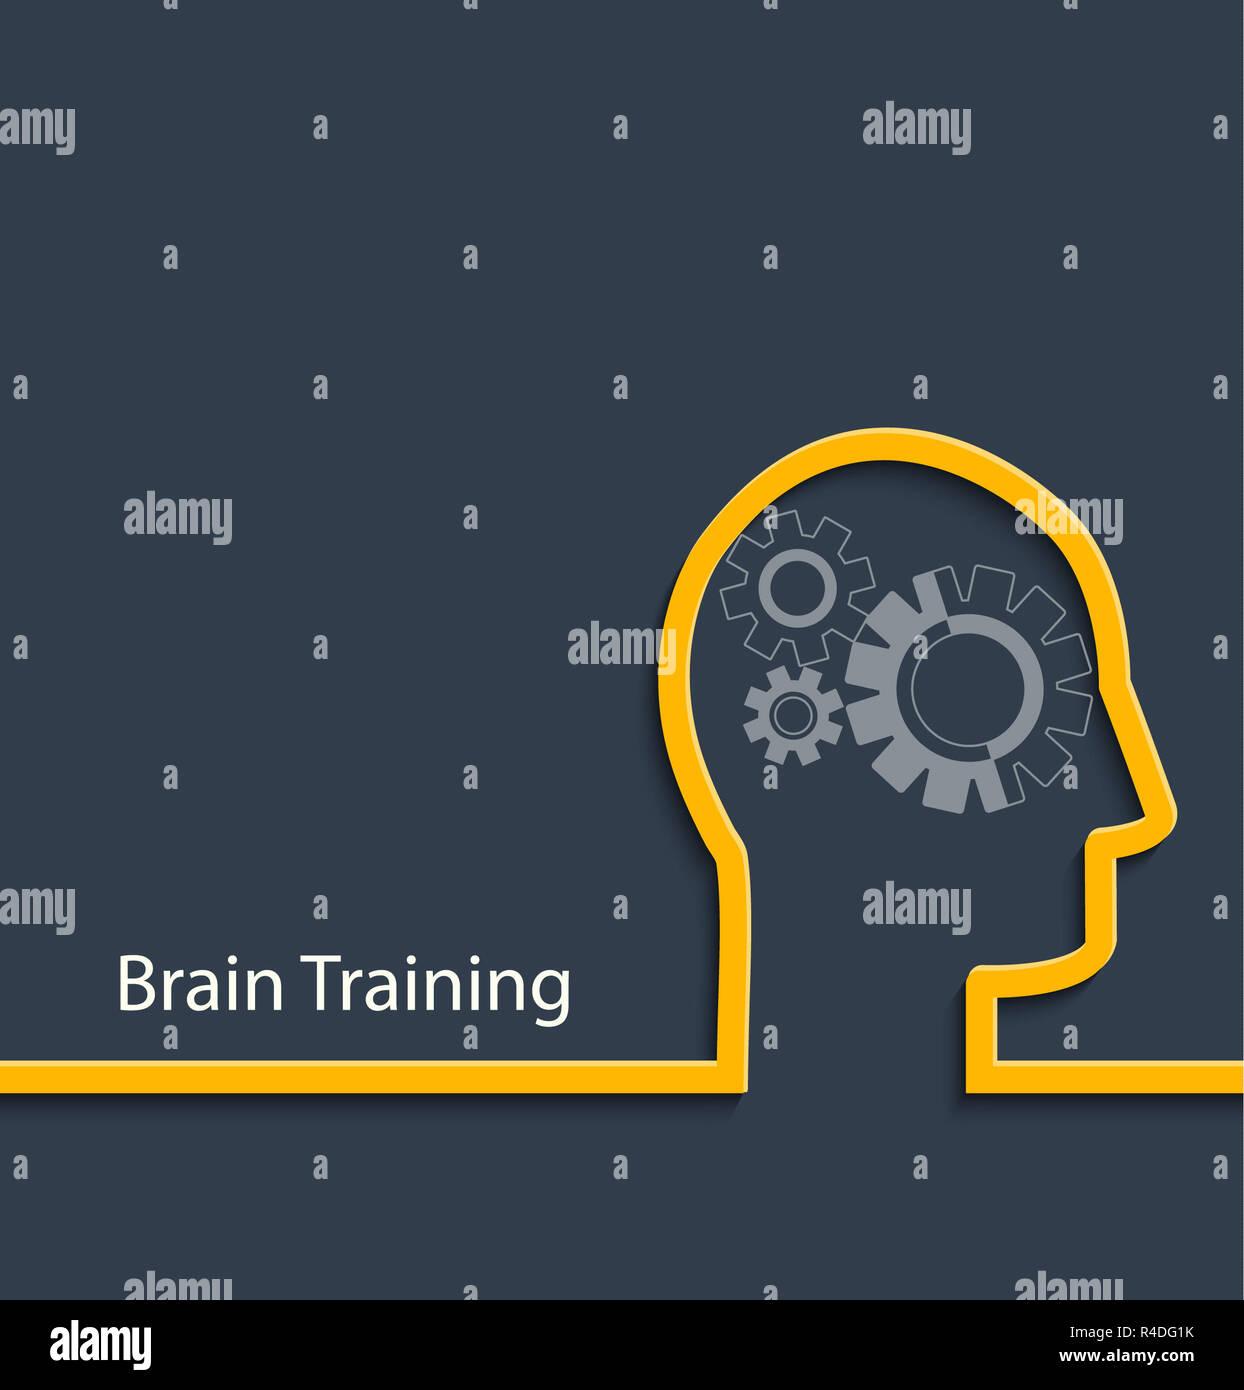 Brain training, vector. - Stock Image